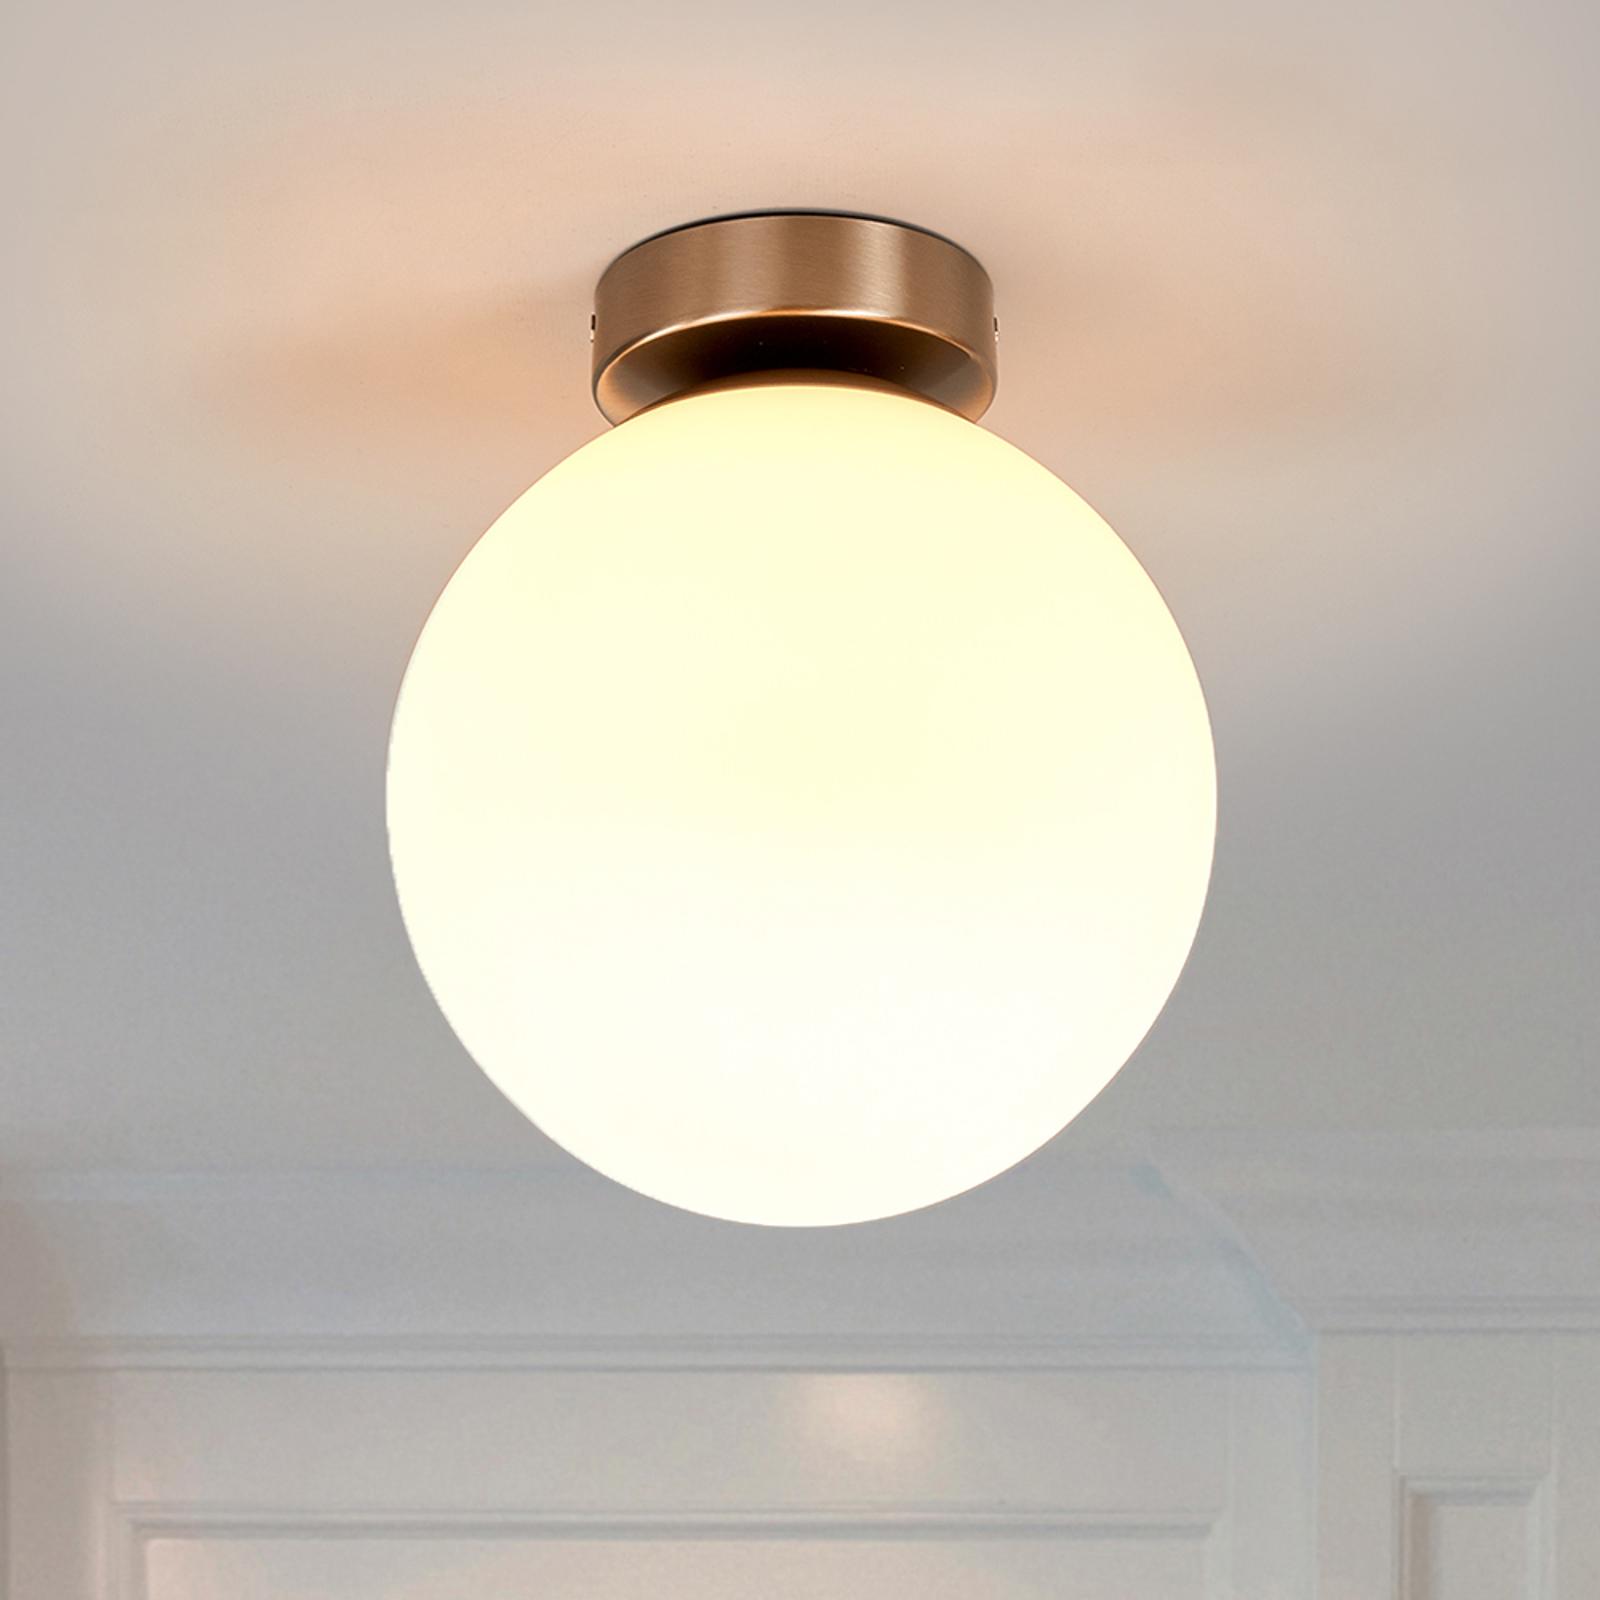 Ronde badkamer plafondlamp Lennie